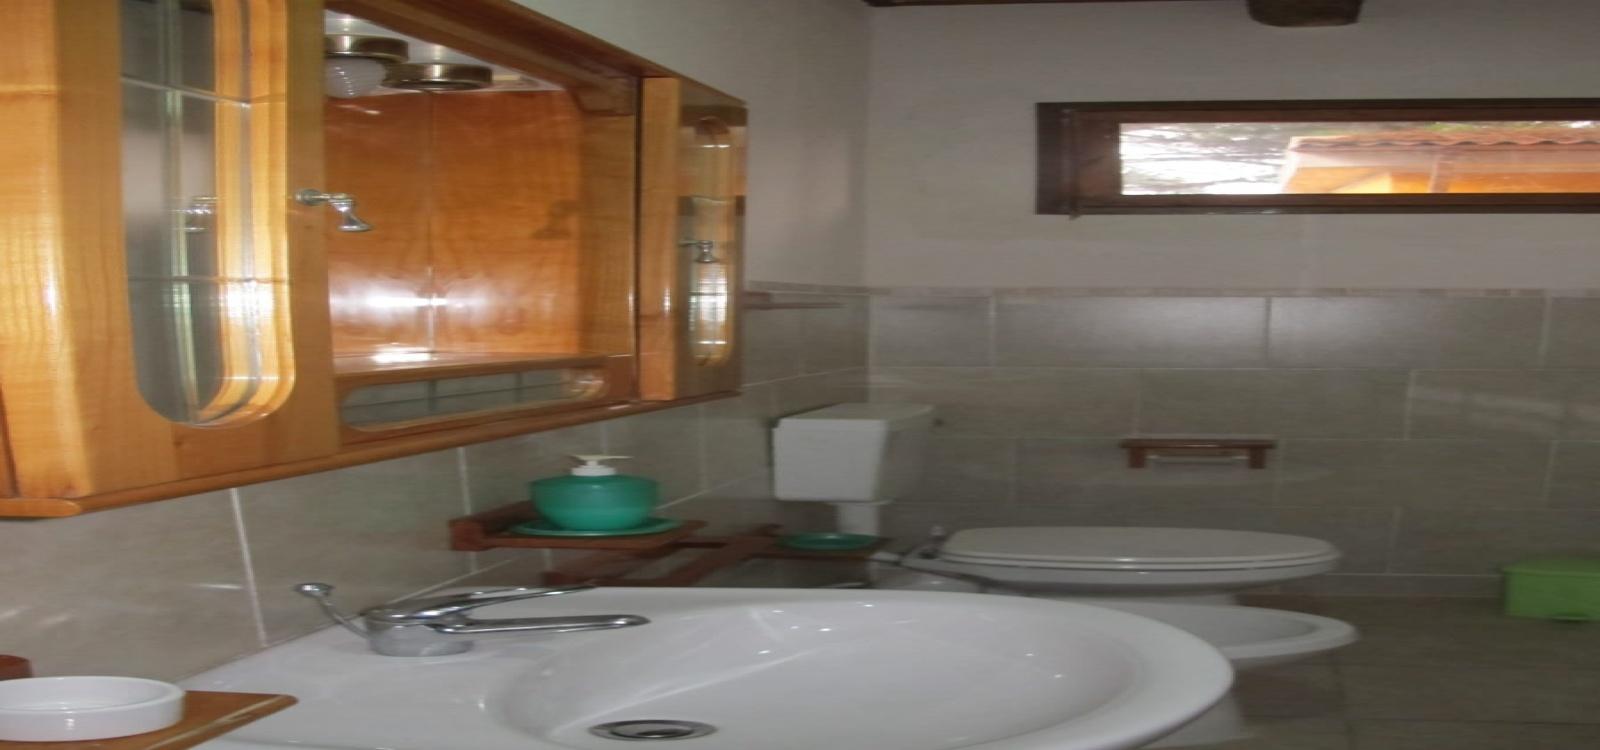 FANUSA,SIRACUSA,Villa,FANUSA,2354